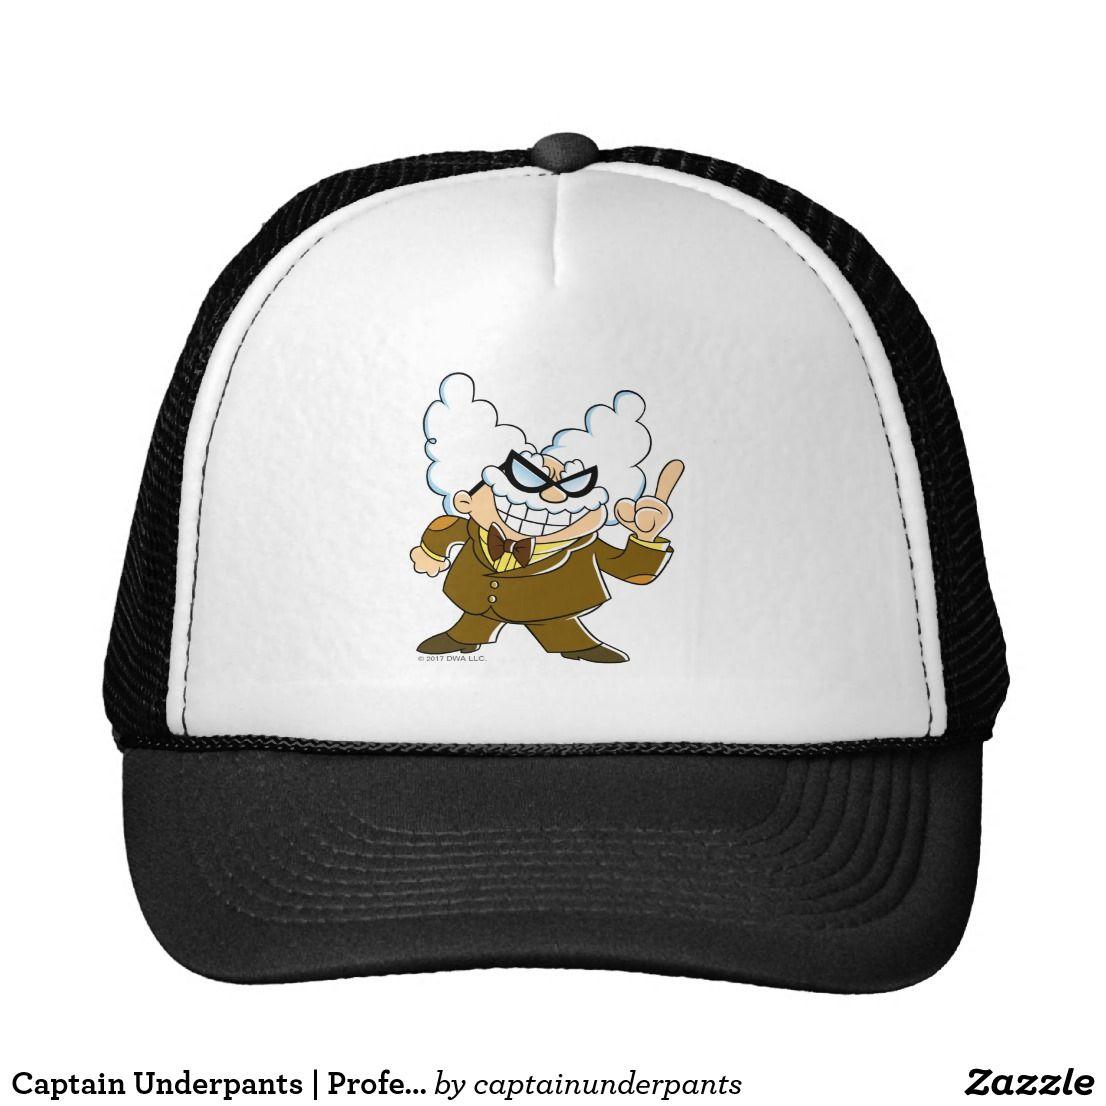 Captain Underpants | Professor Poopypants. Producto disponible en tienda Zazzle. Accesorios, moda. Product available in Zazzle store. Fashion Accessories. Regalos, Gifts. #gorra #hat